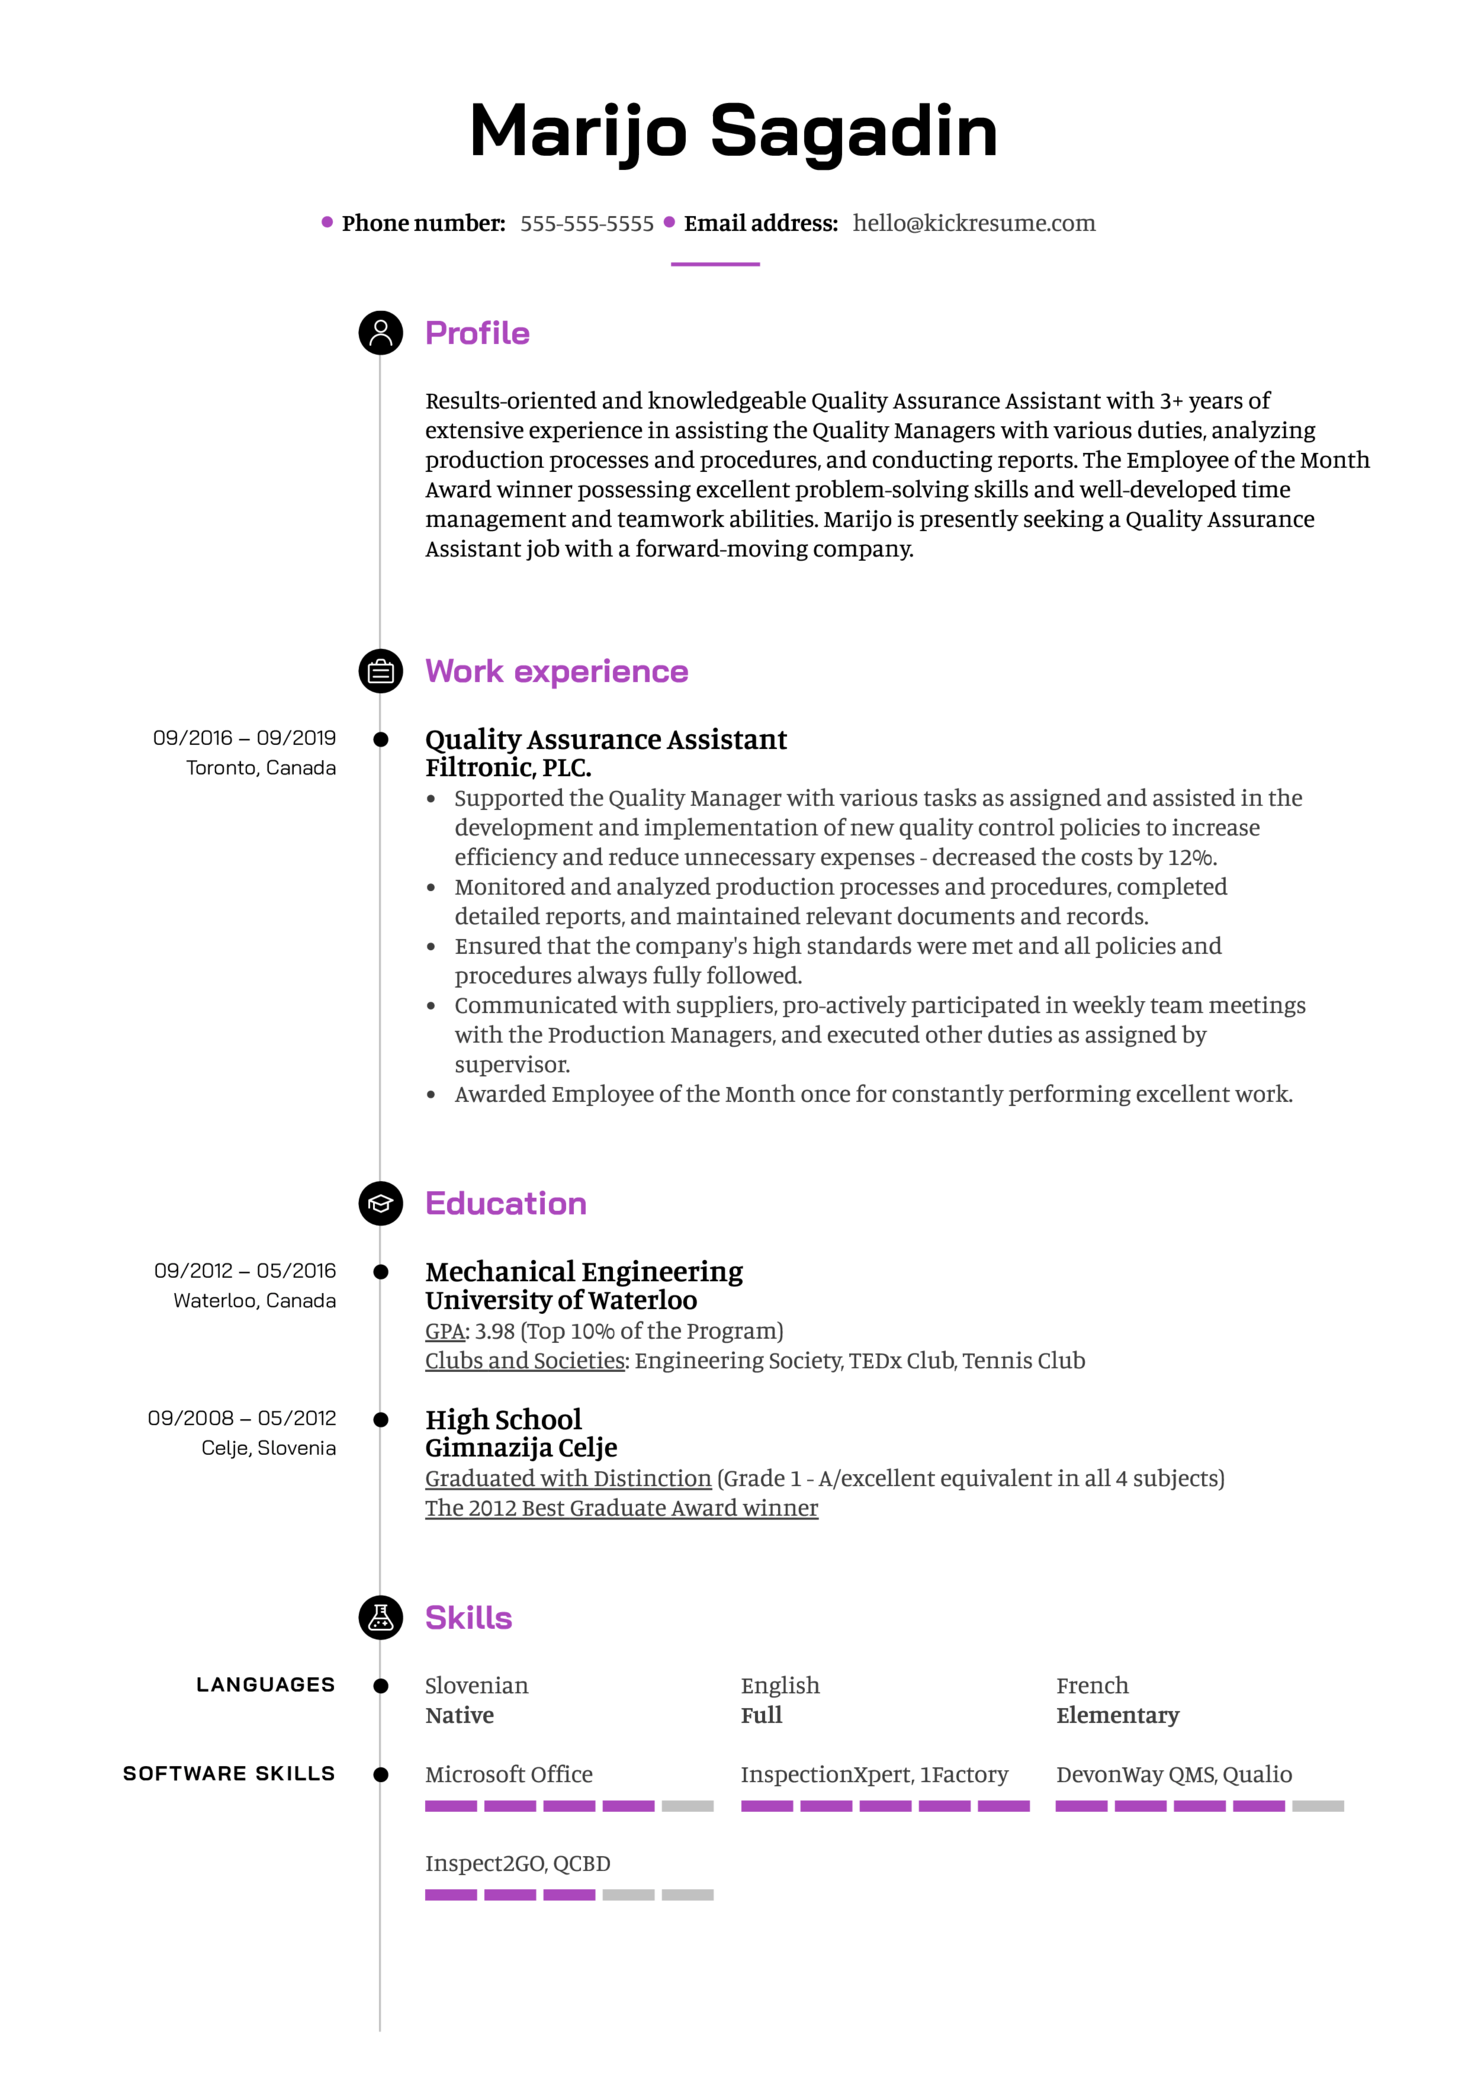 Quality Assurance Assistant Resume Example (časť 1)